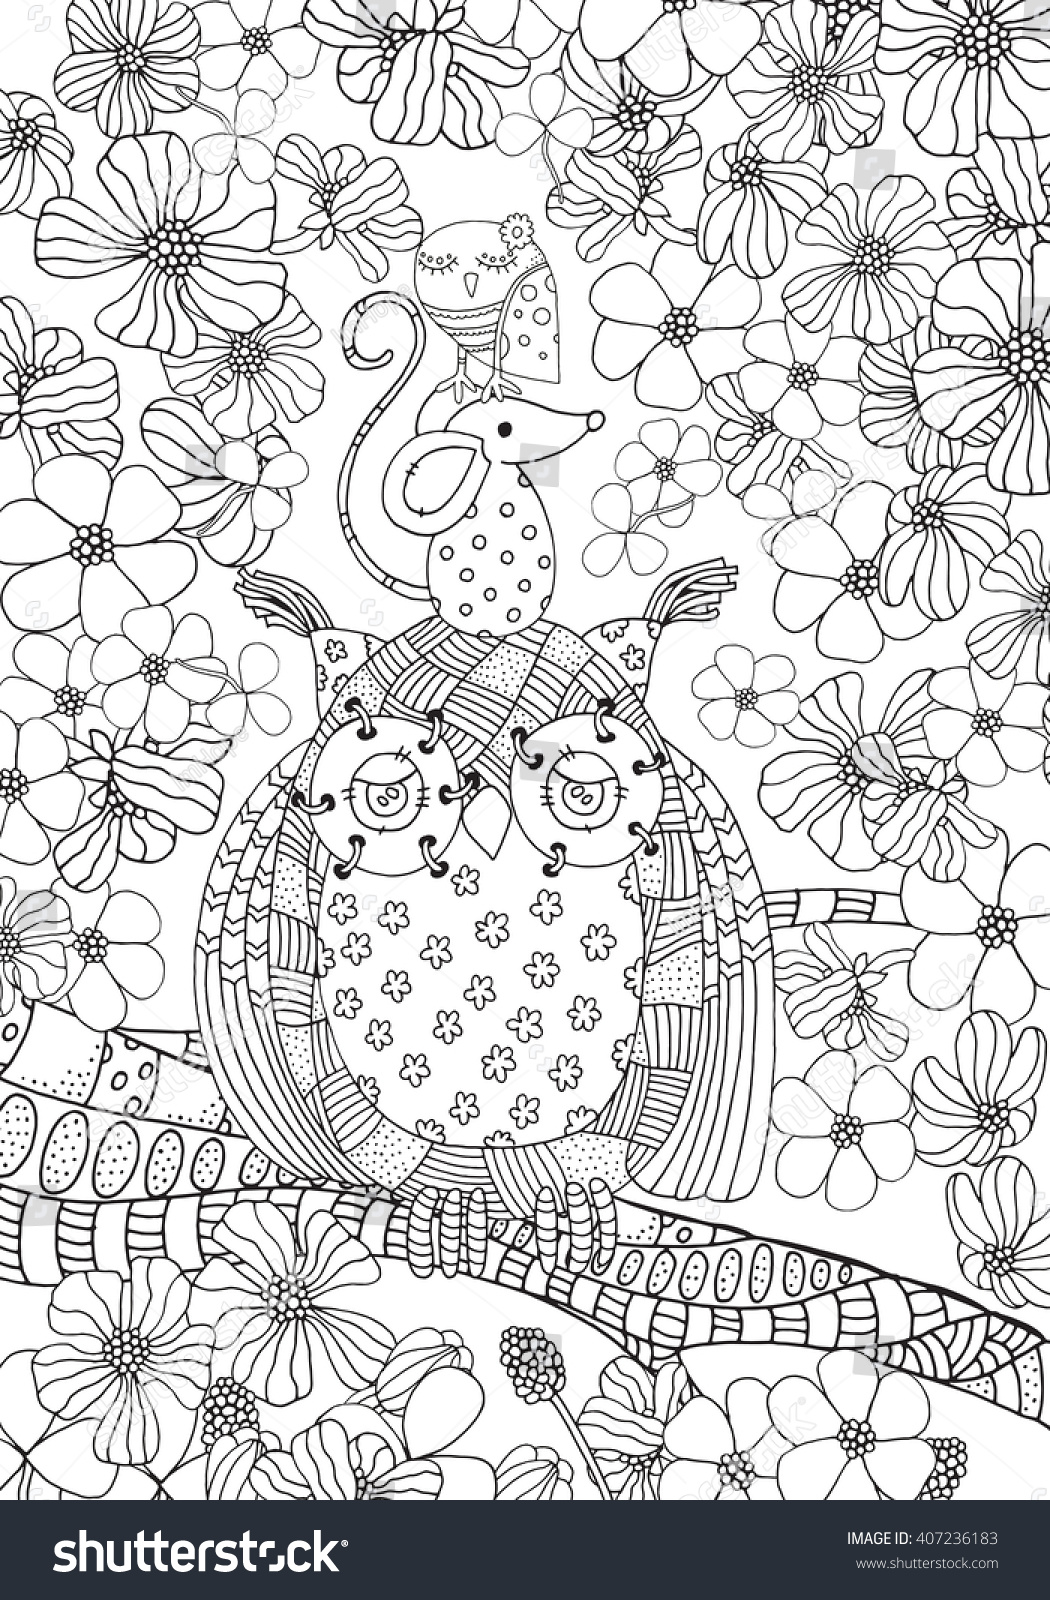 old owl mouse little bird friendship stock vector 407236183